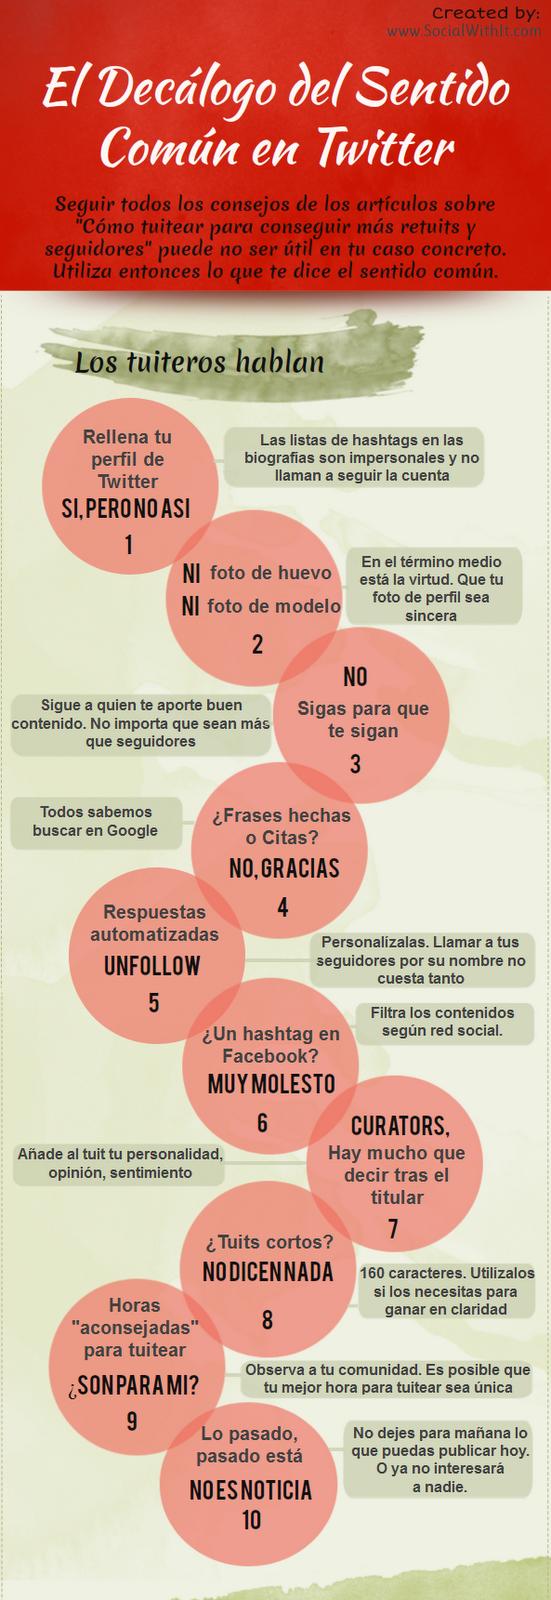 Infografia-decalogo-sentido-comun-en-twitter curioseandito.blogspot.com.es 2012 10 sentido-comun-en-twitter-infografia